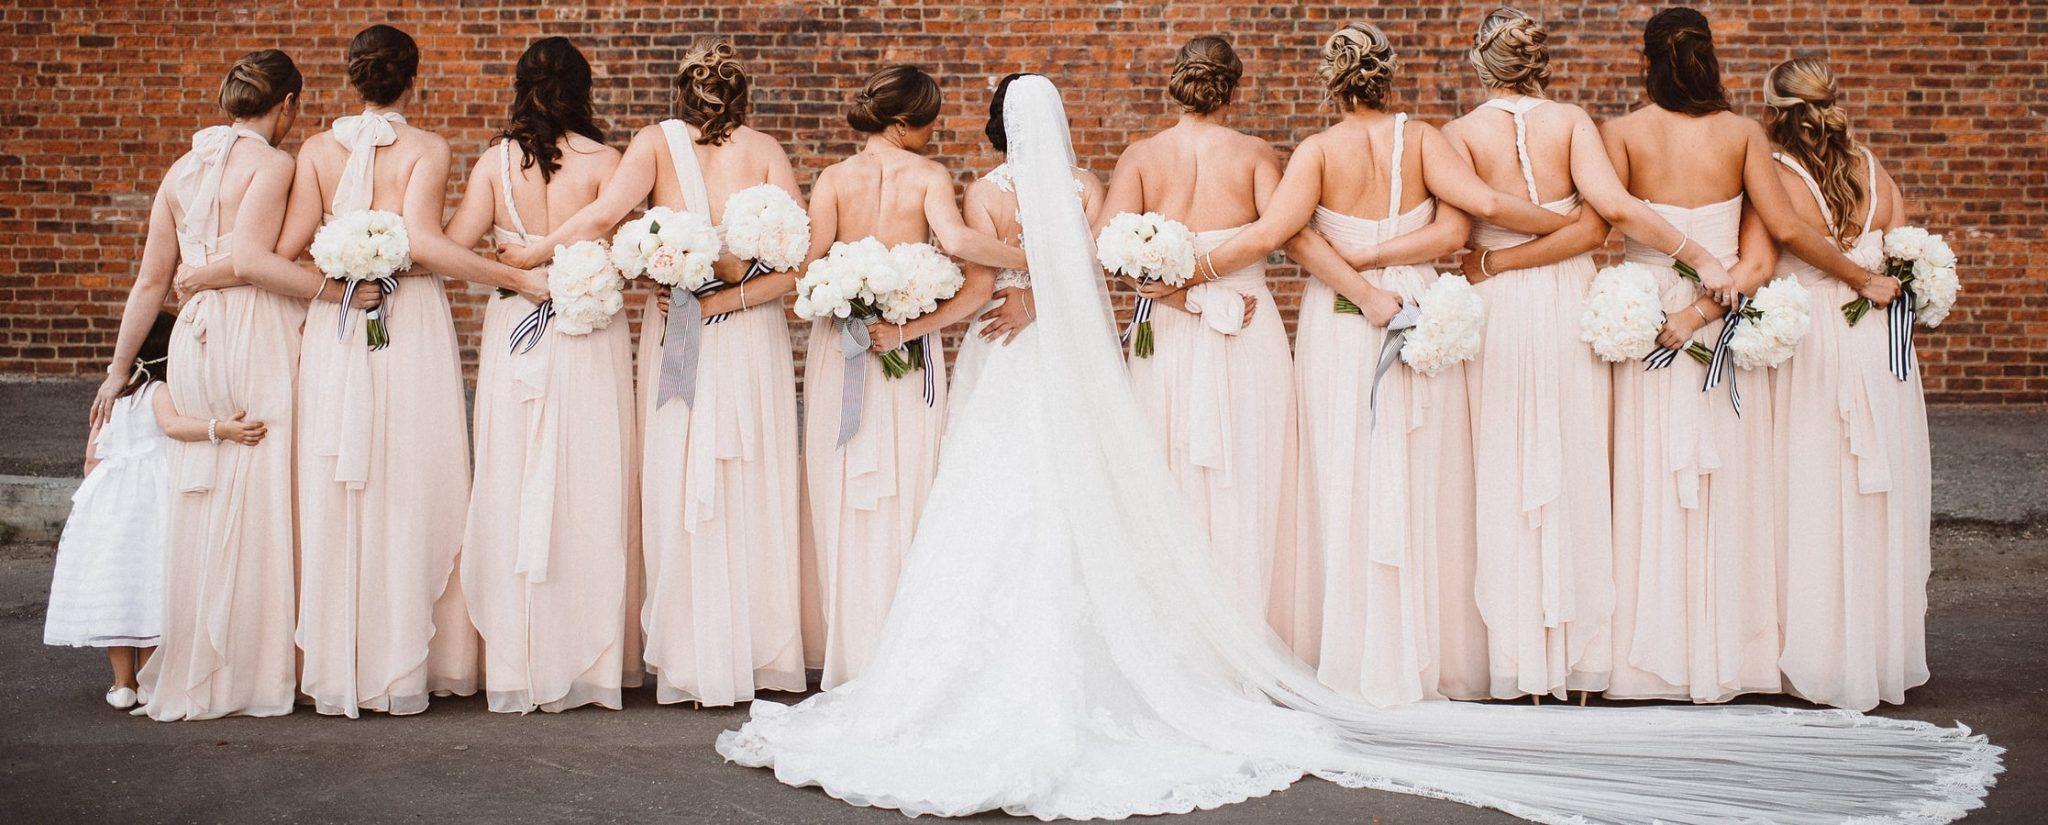 Month of Wedding Planning Philadelphia | The Styled Bride